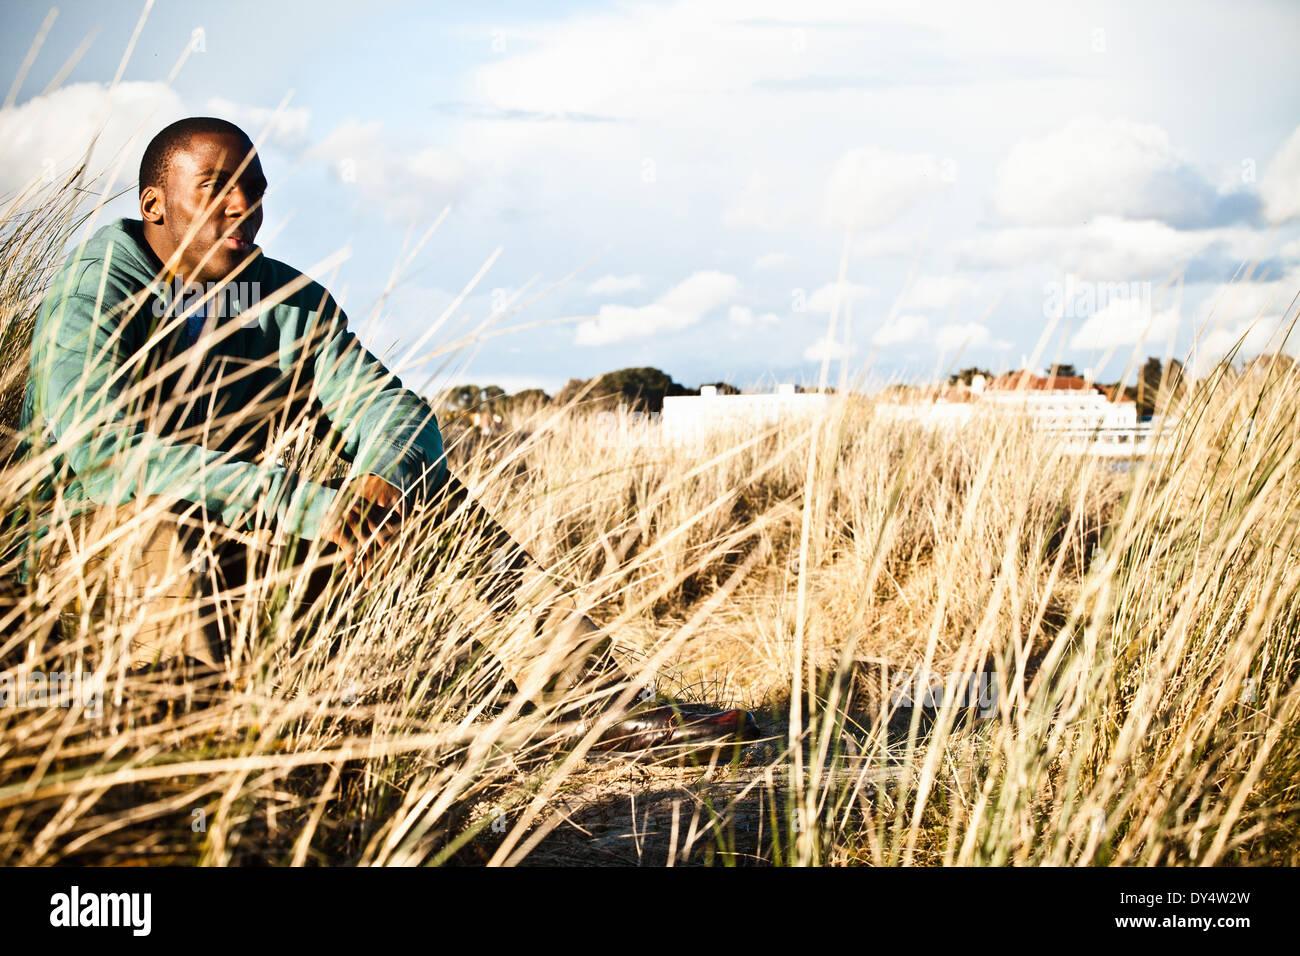 Young man sitting in sand dunes, Bournemouth, Dorset, UK - Stock Image